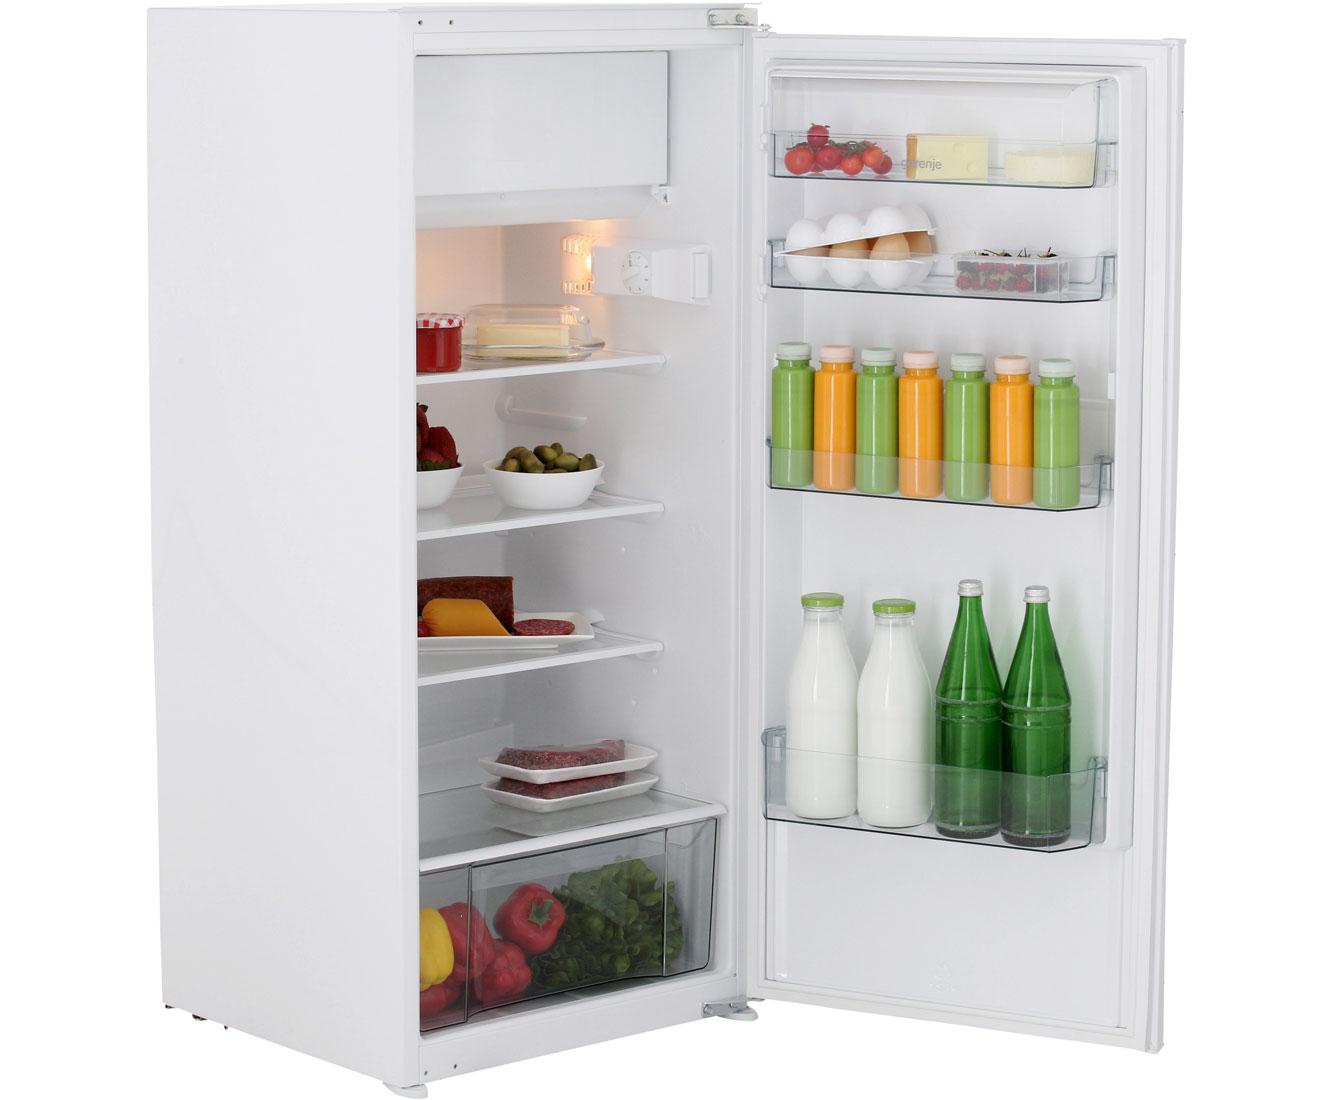 Amica Retro Kühlschrank Test : Bomann retro kühlschrank test: kühlschrank gefrierschrank